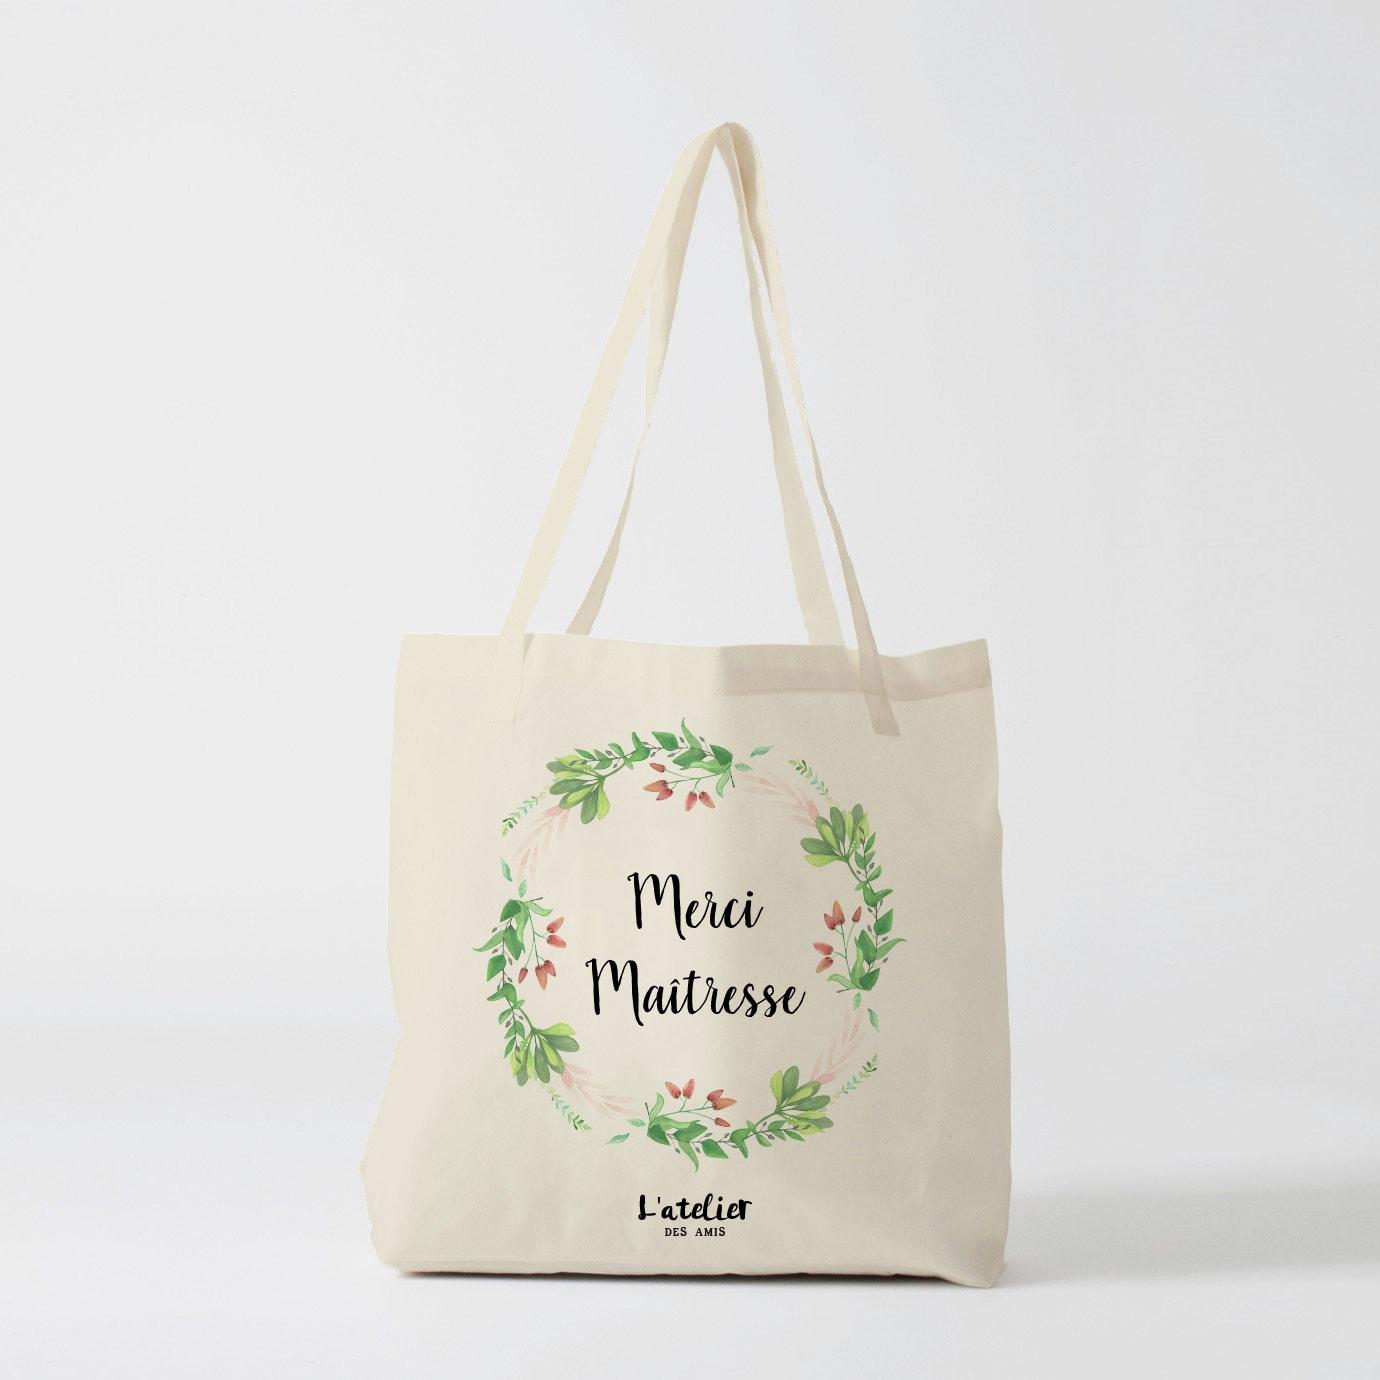 w147y tote bag personnalis ma tresse sac de toile cabas. Black Bedroom Furniture Sets. Home Design Ideas